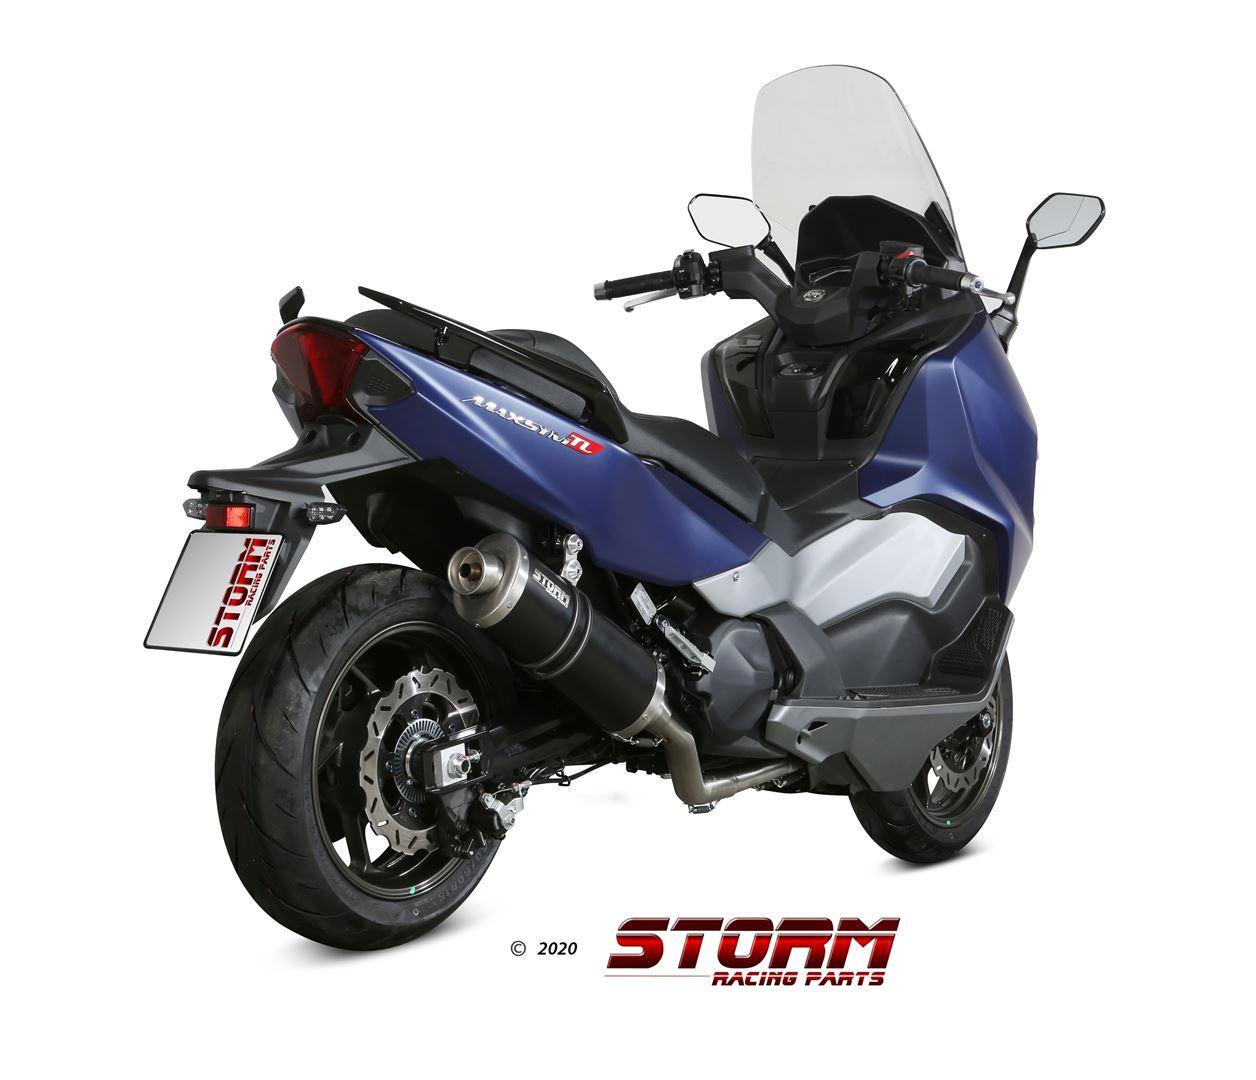 SYM MAXSYM 500 TL Exhaust Storm Oval Black stainless steel SY.002.LX2B